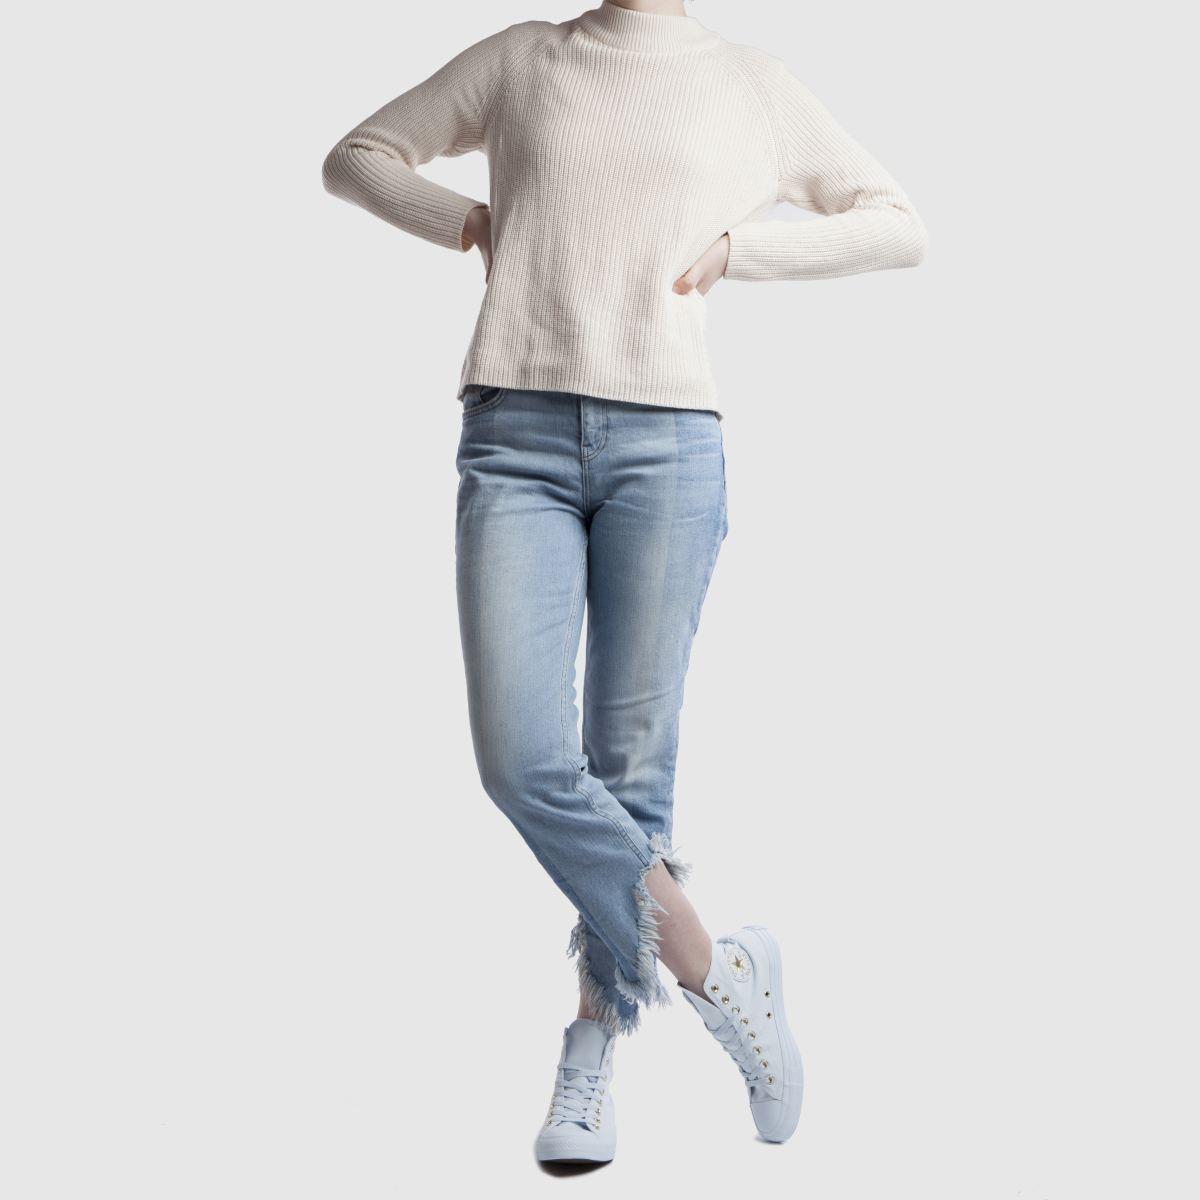 Damen Hellblau converse All Star Mono Glam Hi Sneaker | schuh Gute Qualität beliebte Schuhe